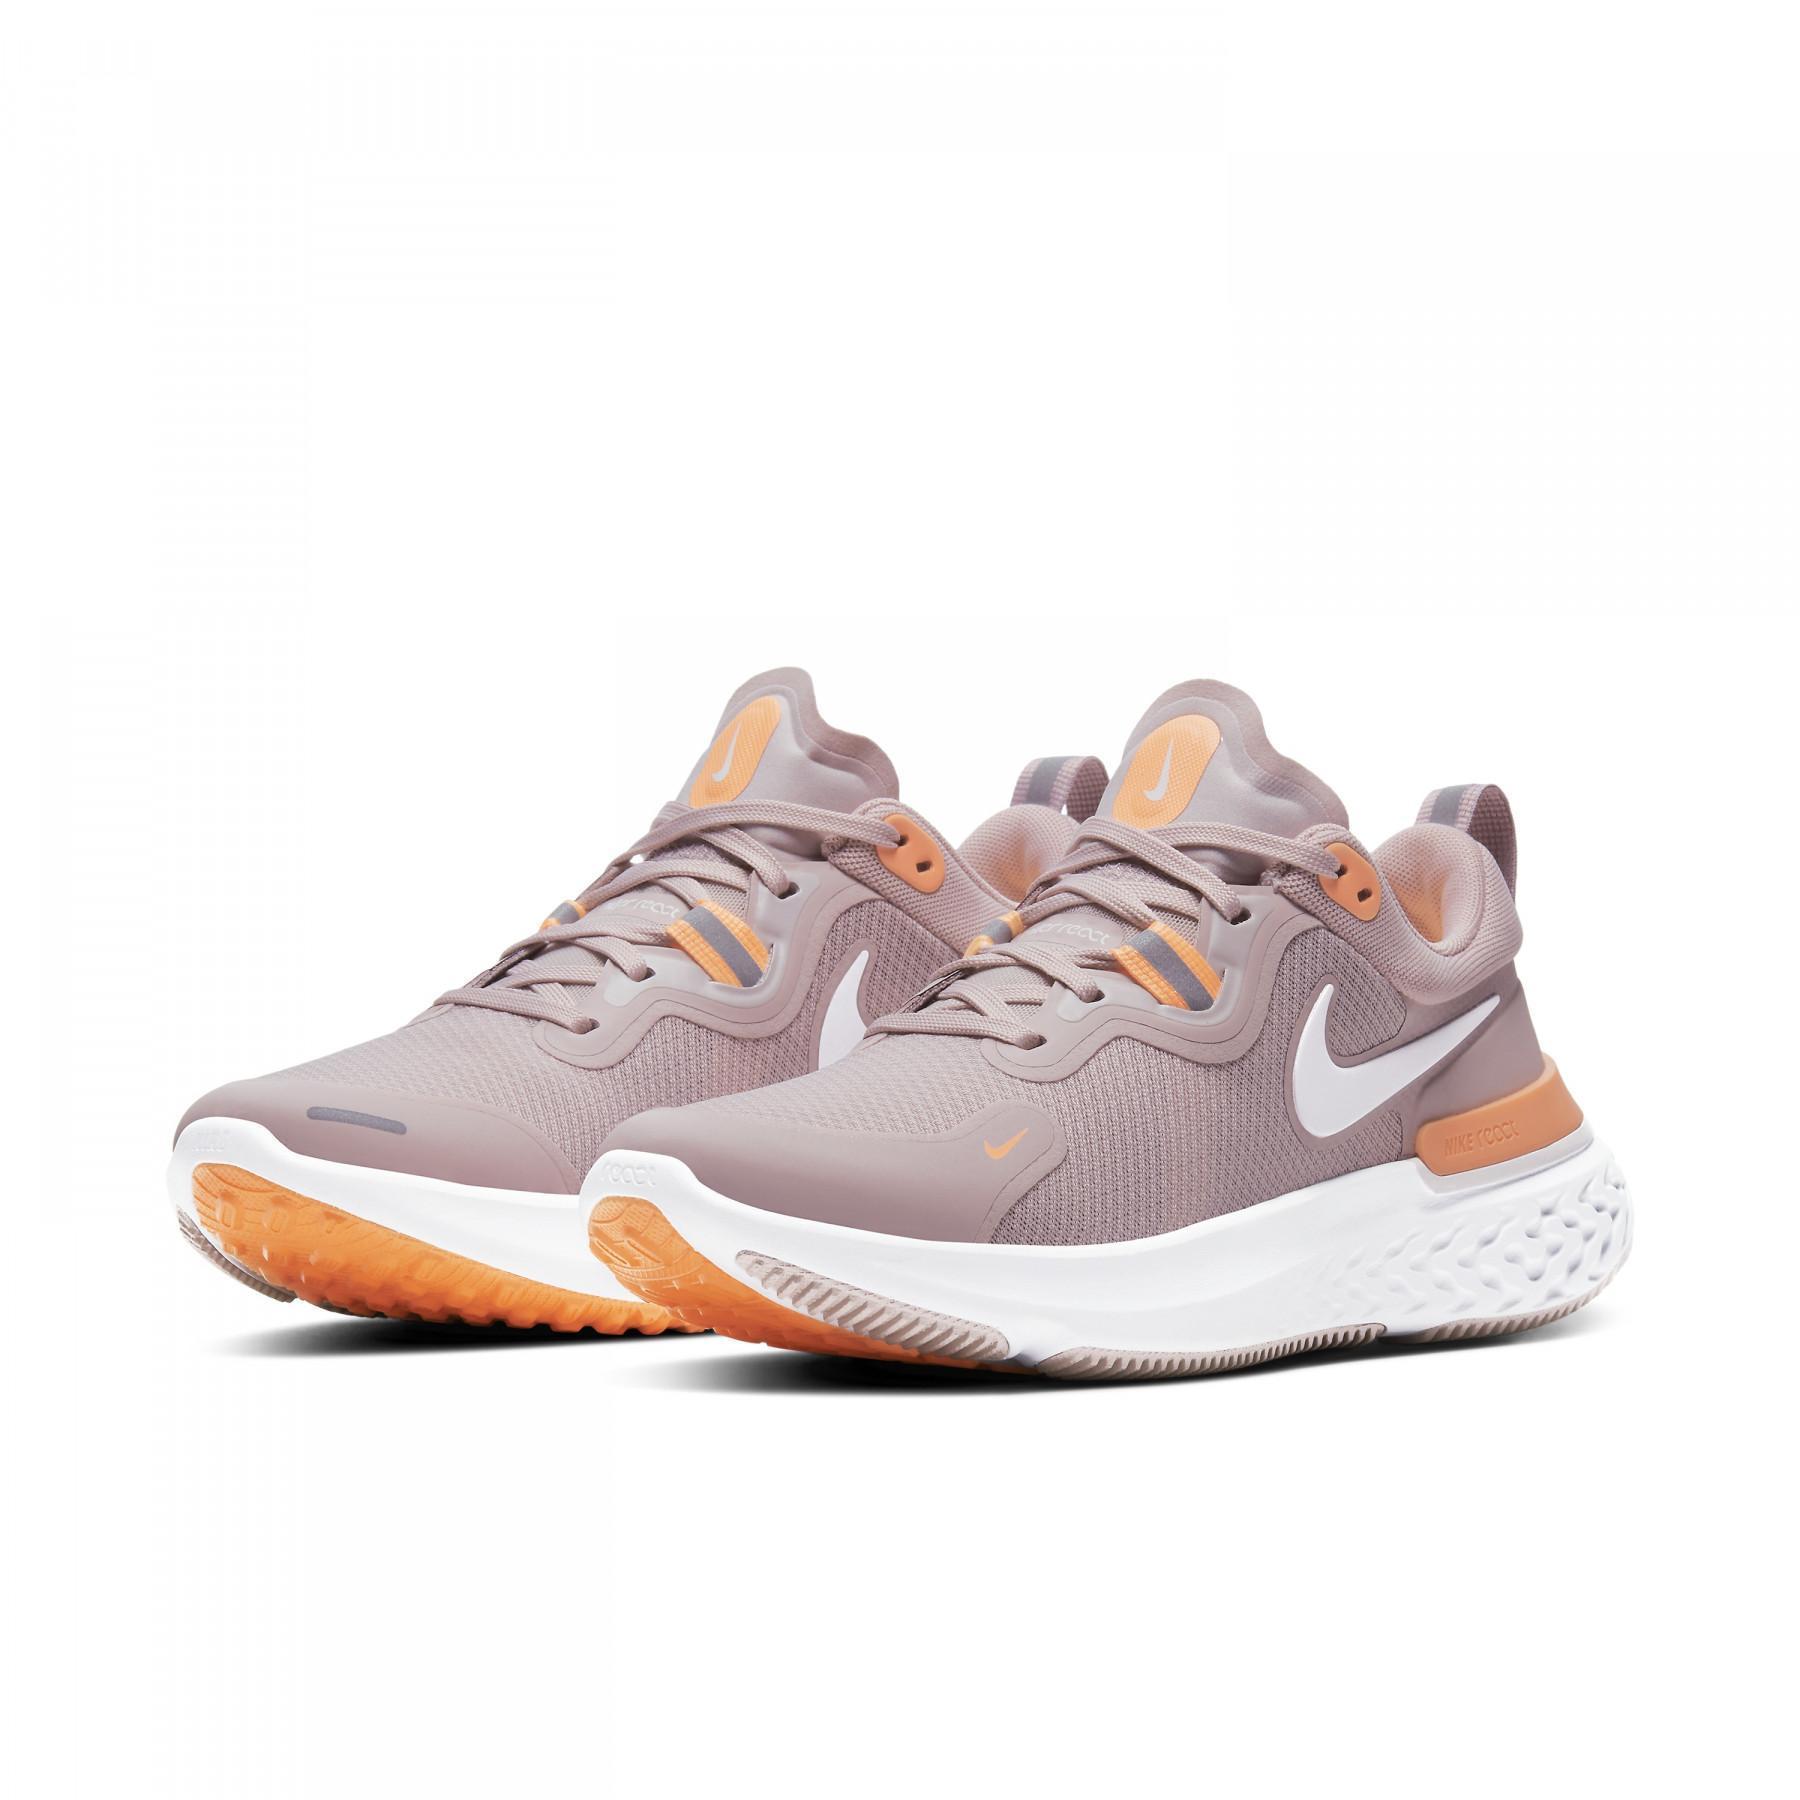 Chaussures femme Nike React Miler